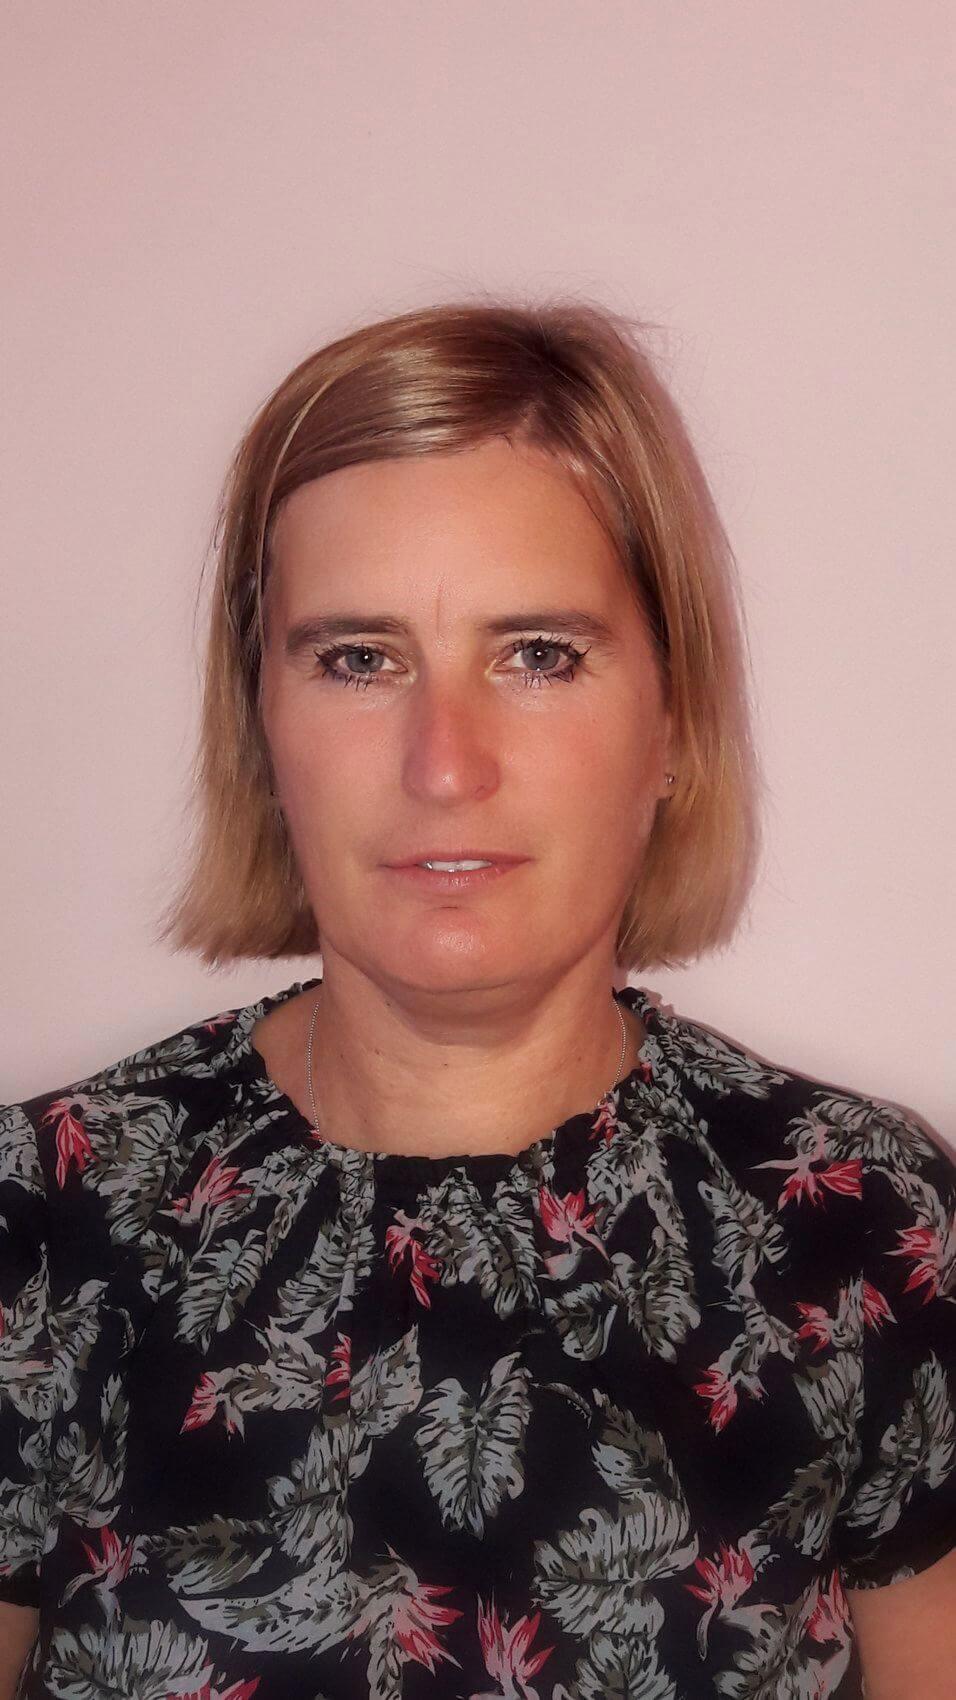 Heidrun Weinmann